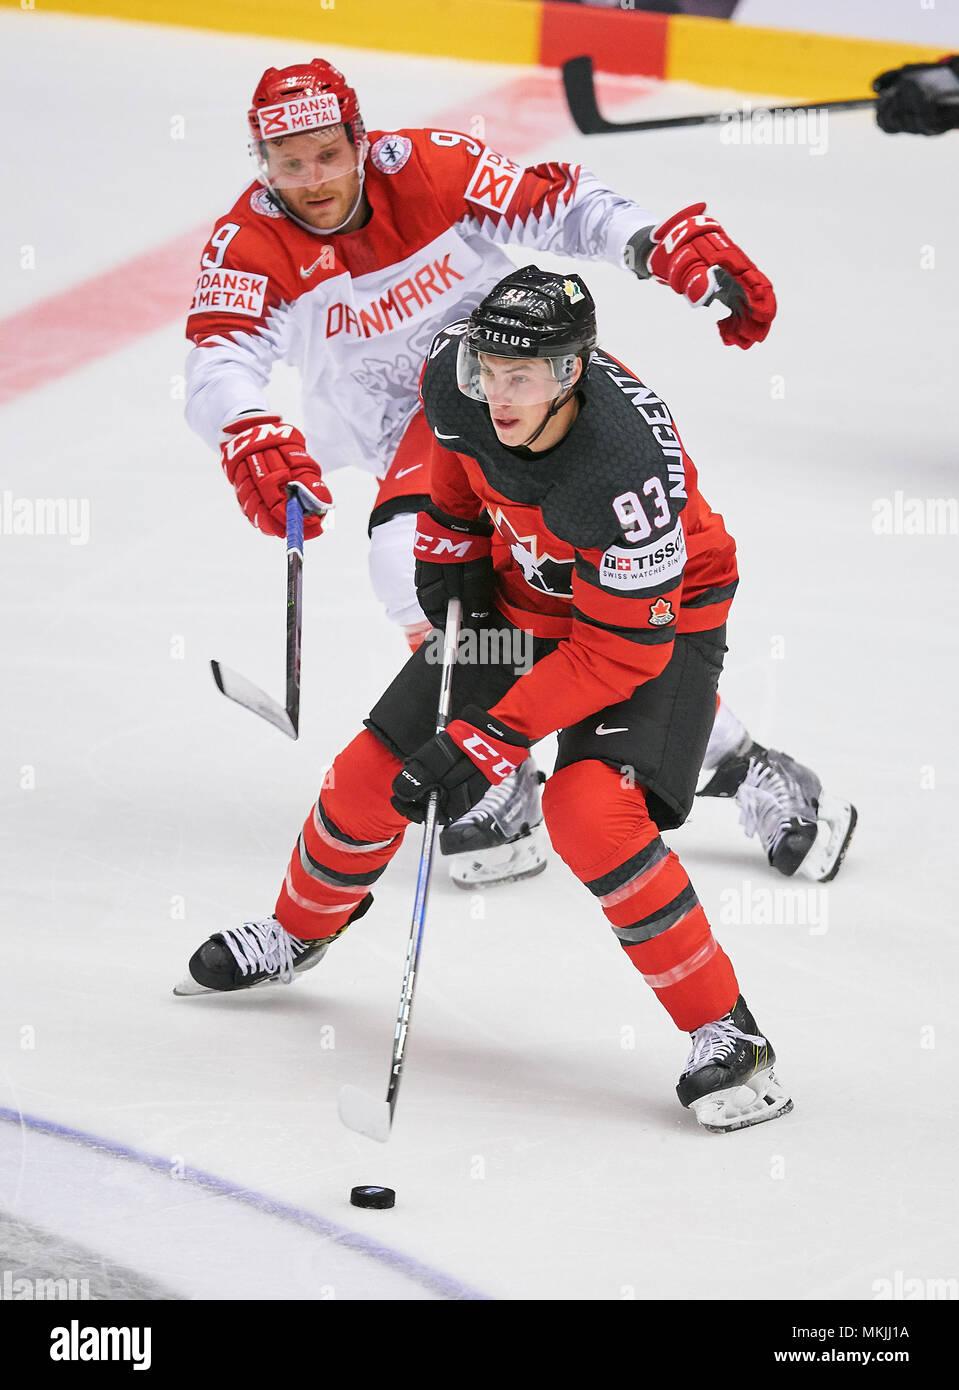 Herning, Denmark May 07, 2018. IIHF Ice Hockey World Cup 2018, Herning, May 07, 2018 Ryan NUGENT-HOPKINS, CAN 93 Frederik STORM, DAN 9   CANADA - DENMARK 7-1 Icehockey Worldcup 2018 DEB , in Herning, Denmark May 07, 2018 © Peter Schatz / Alamy Live News Stock Photo